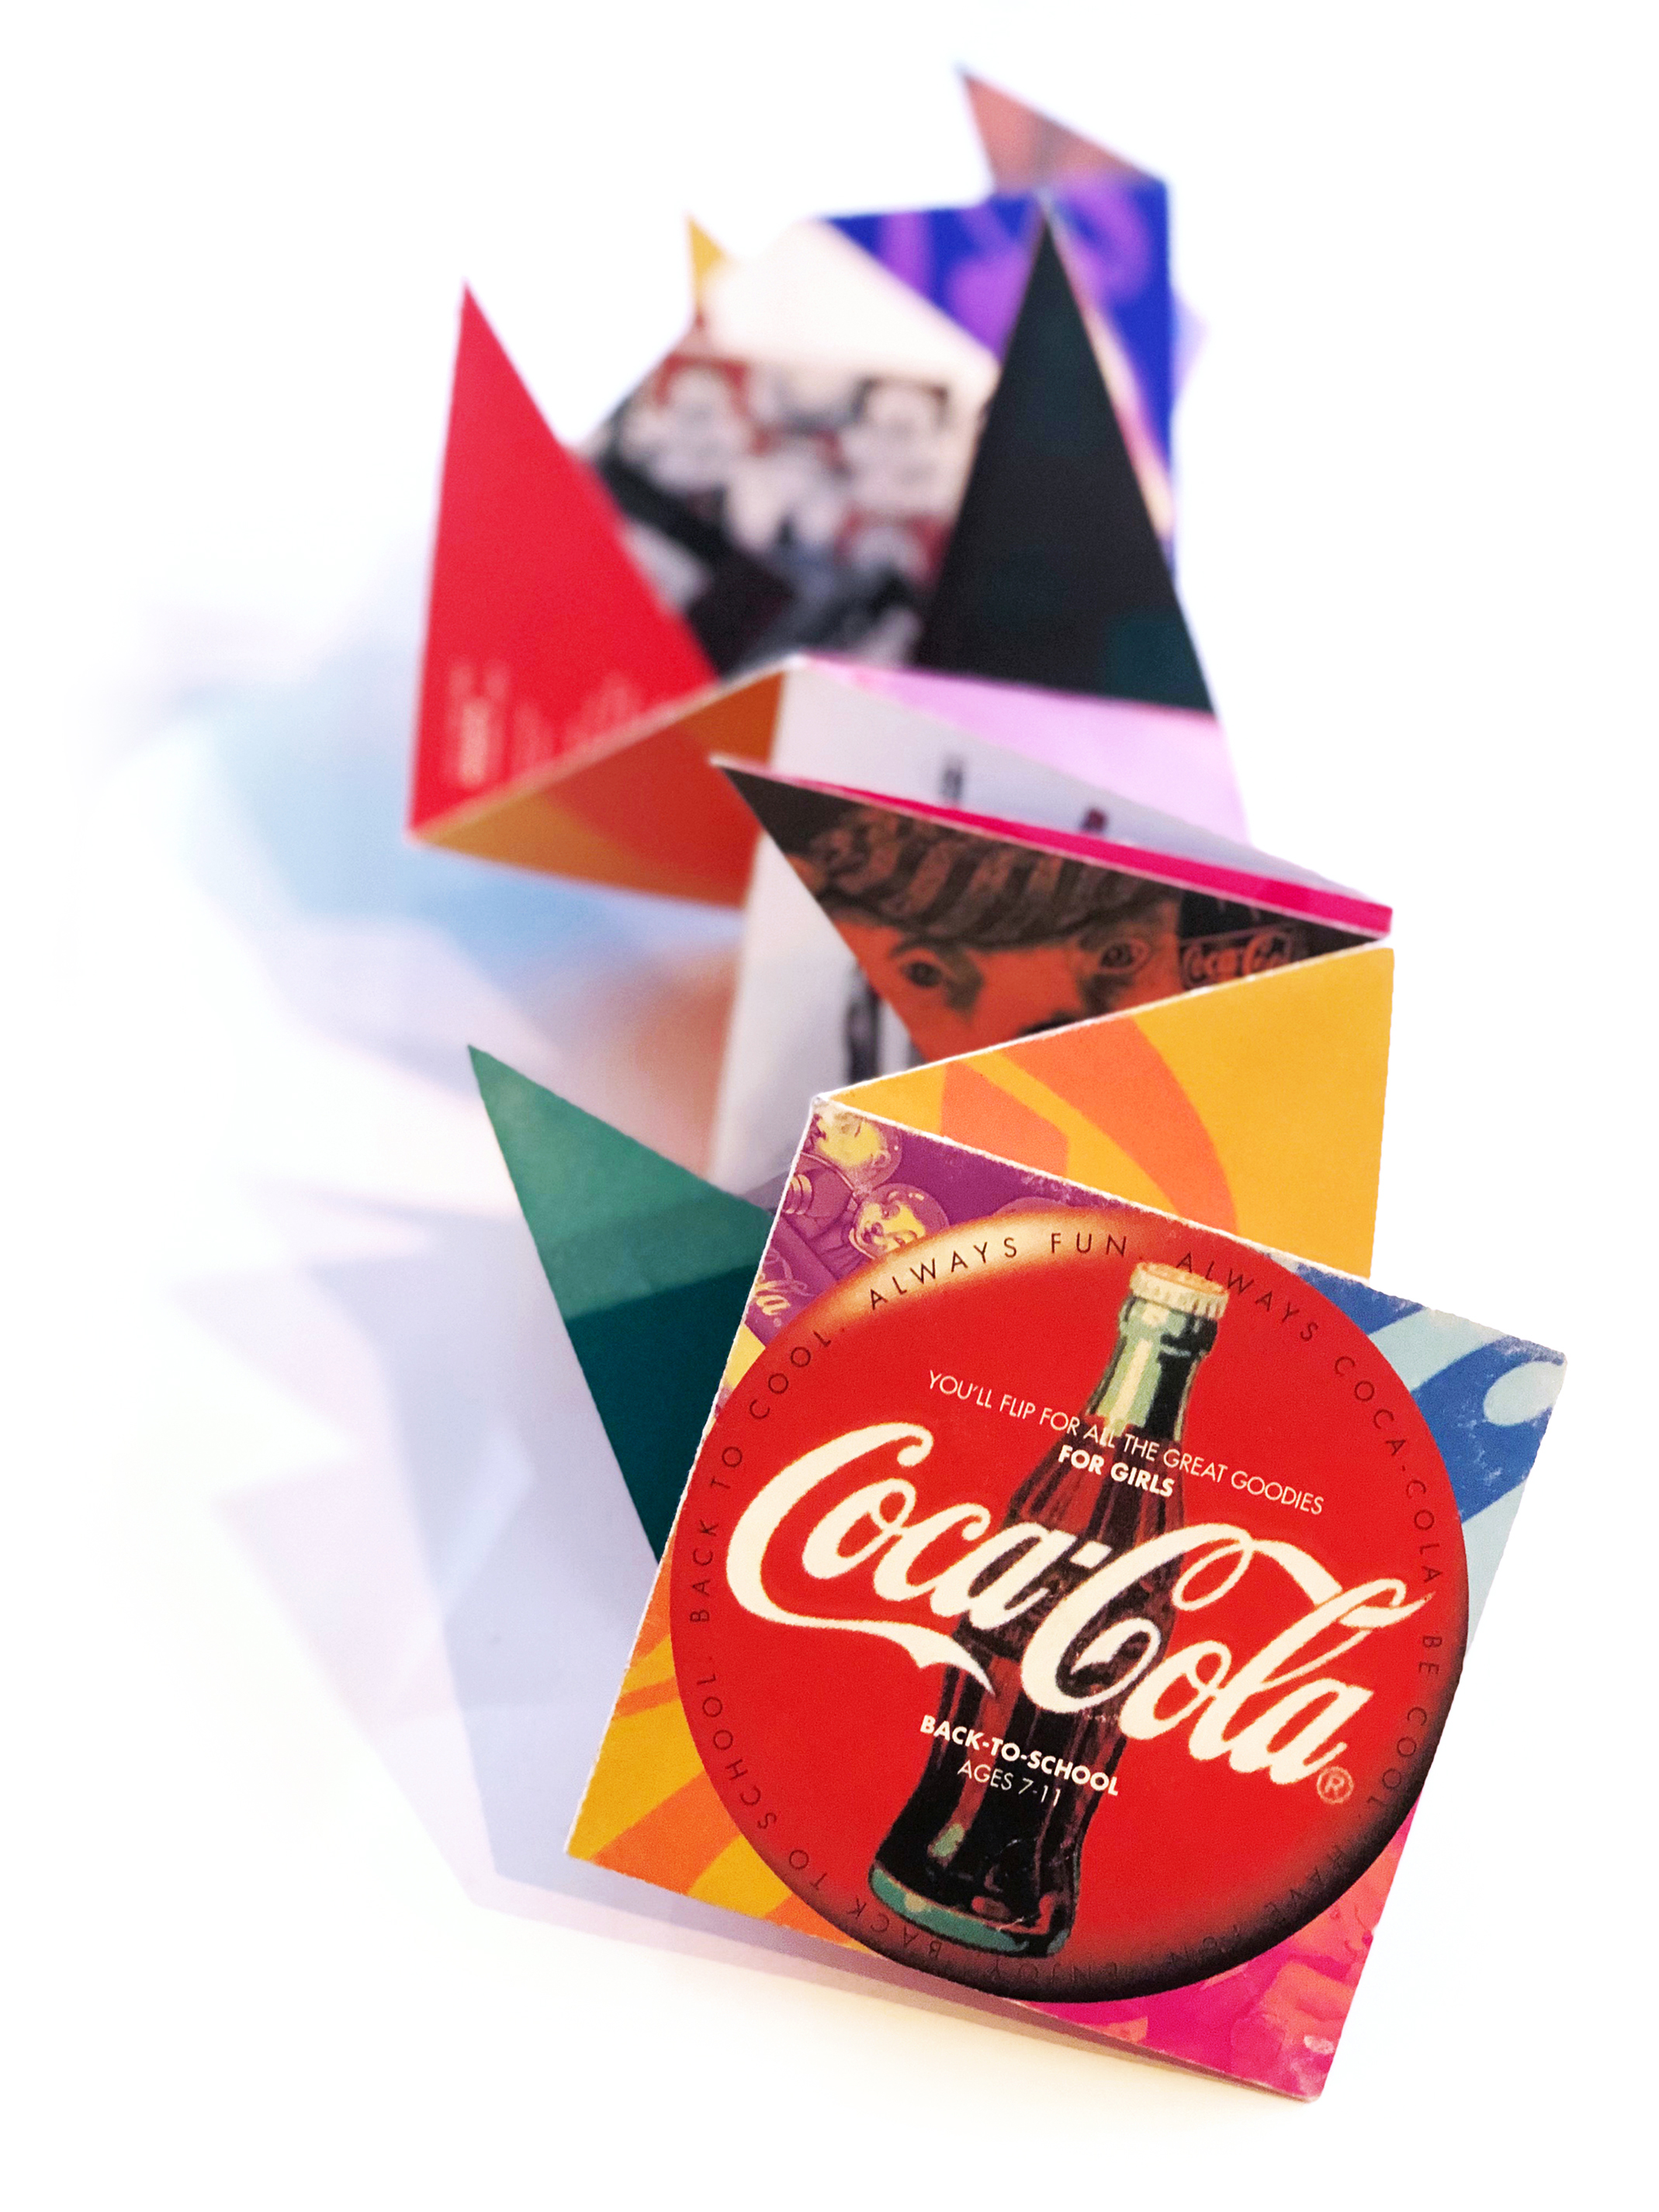 Coca Cola  Back-to-School Product Catalog (origami fold)